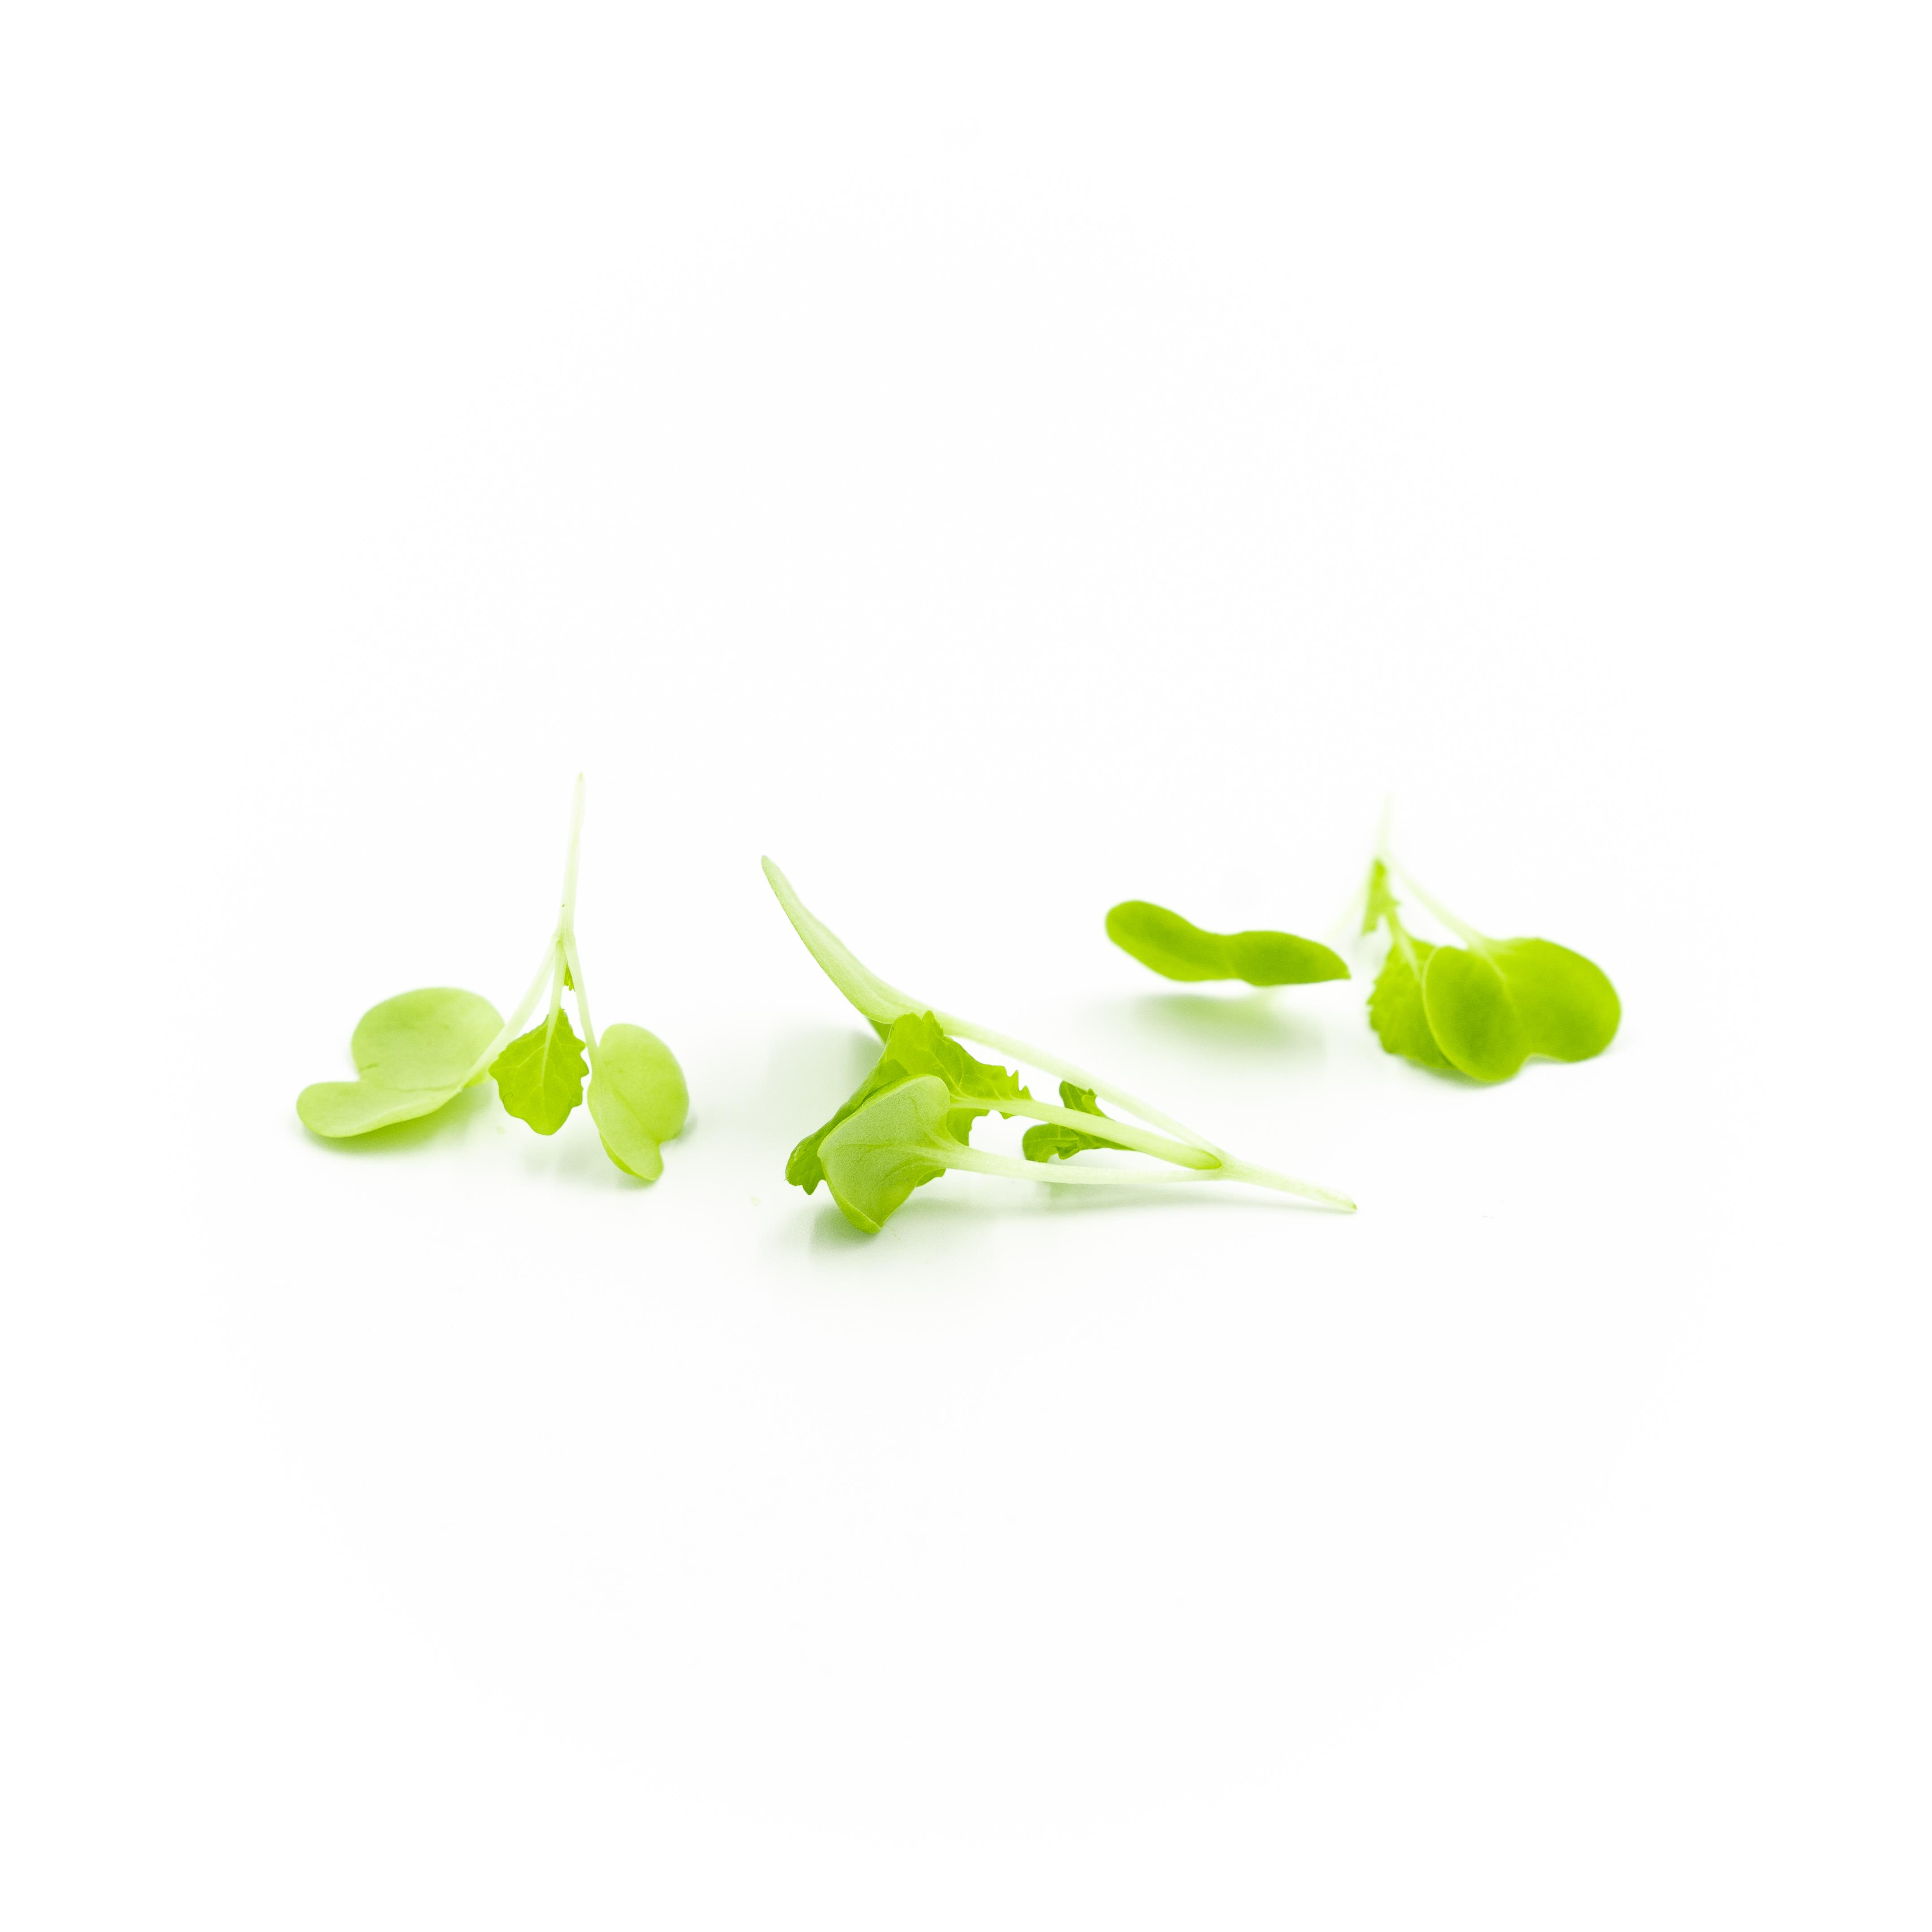 Micro Cabbage (Tokyo Bekana)